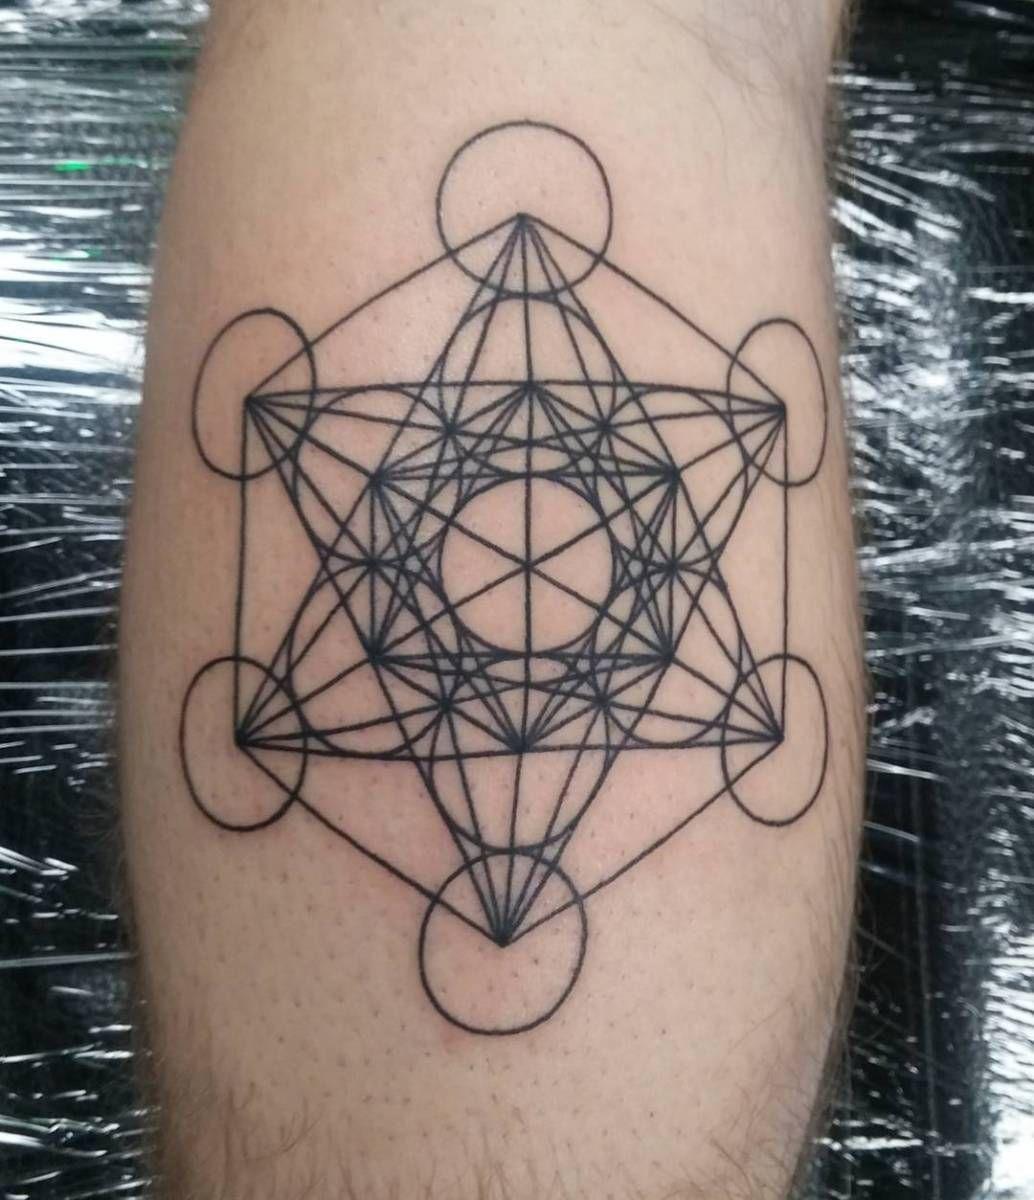 Mandala Outer Forearm Tattoo Ideas For Women Black Henna Floral